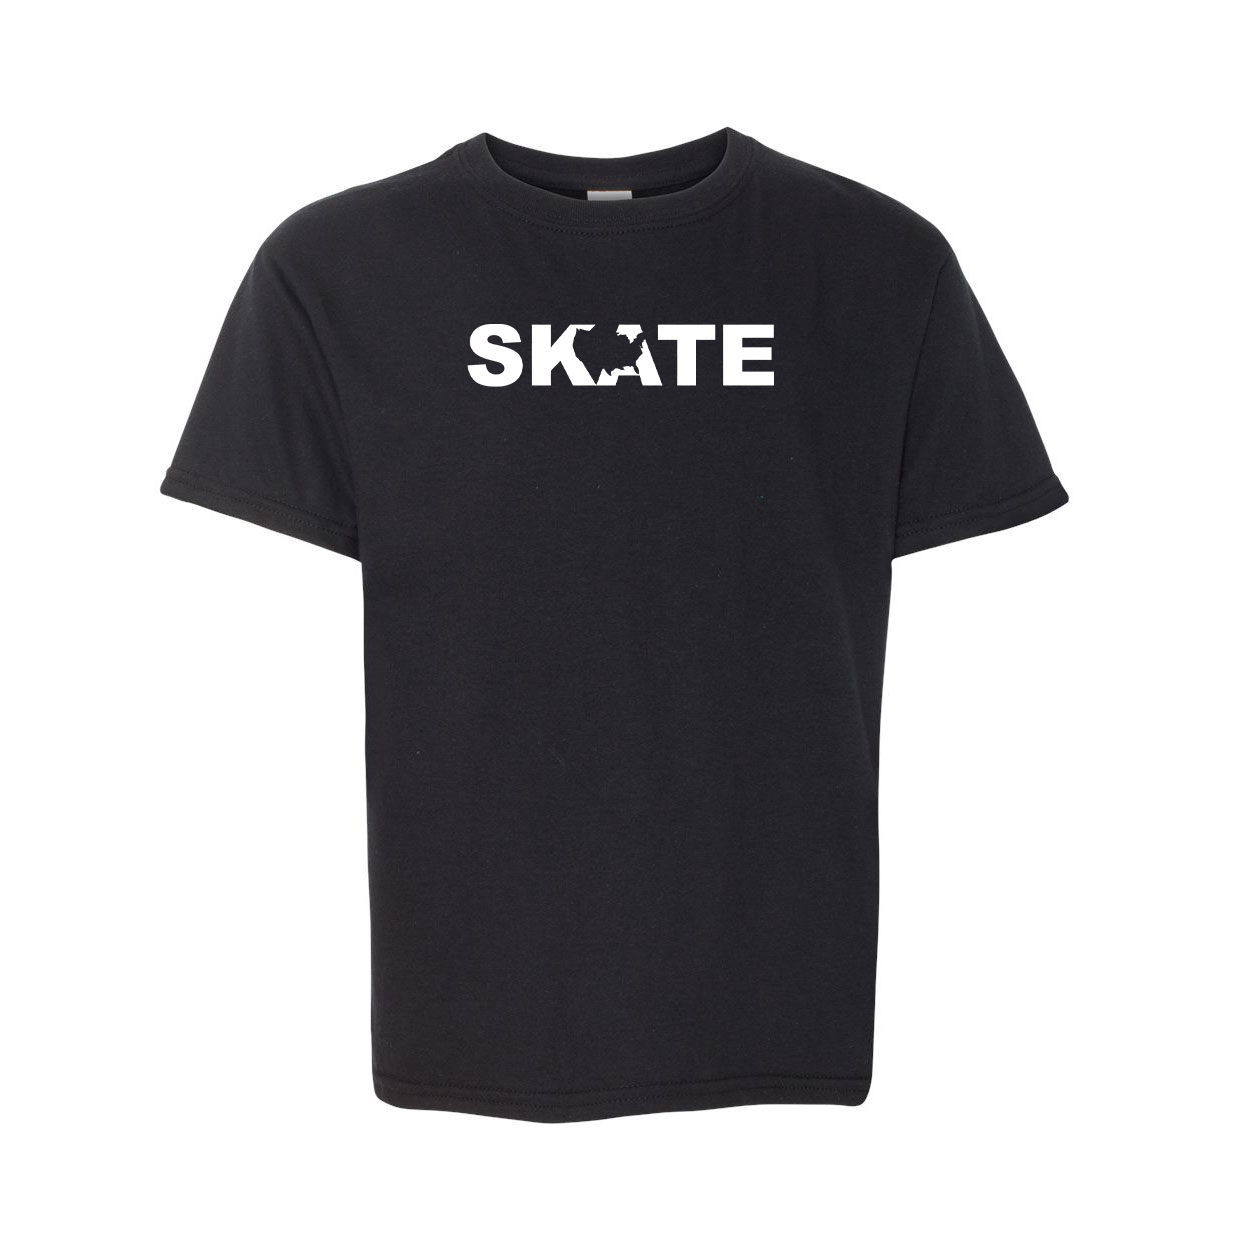 Skate United States Classic Youth T-Shirt Black (White Logo)